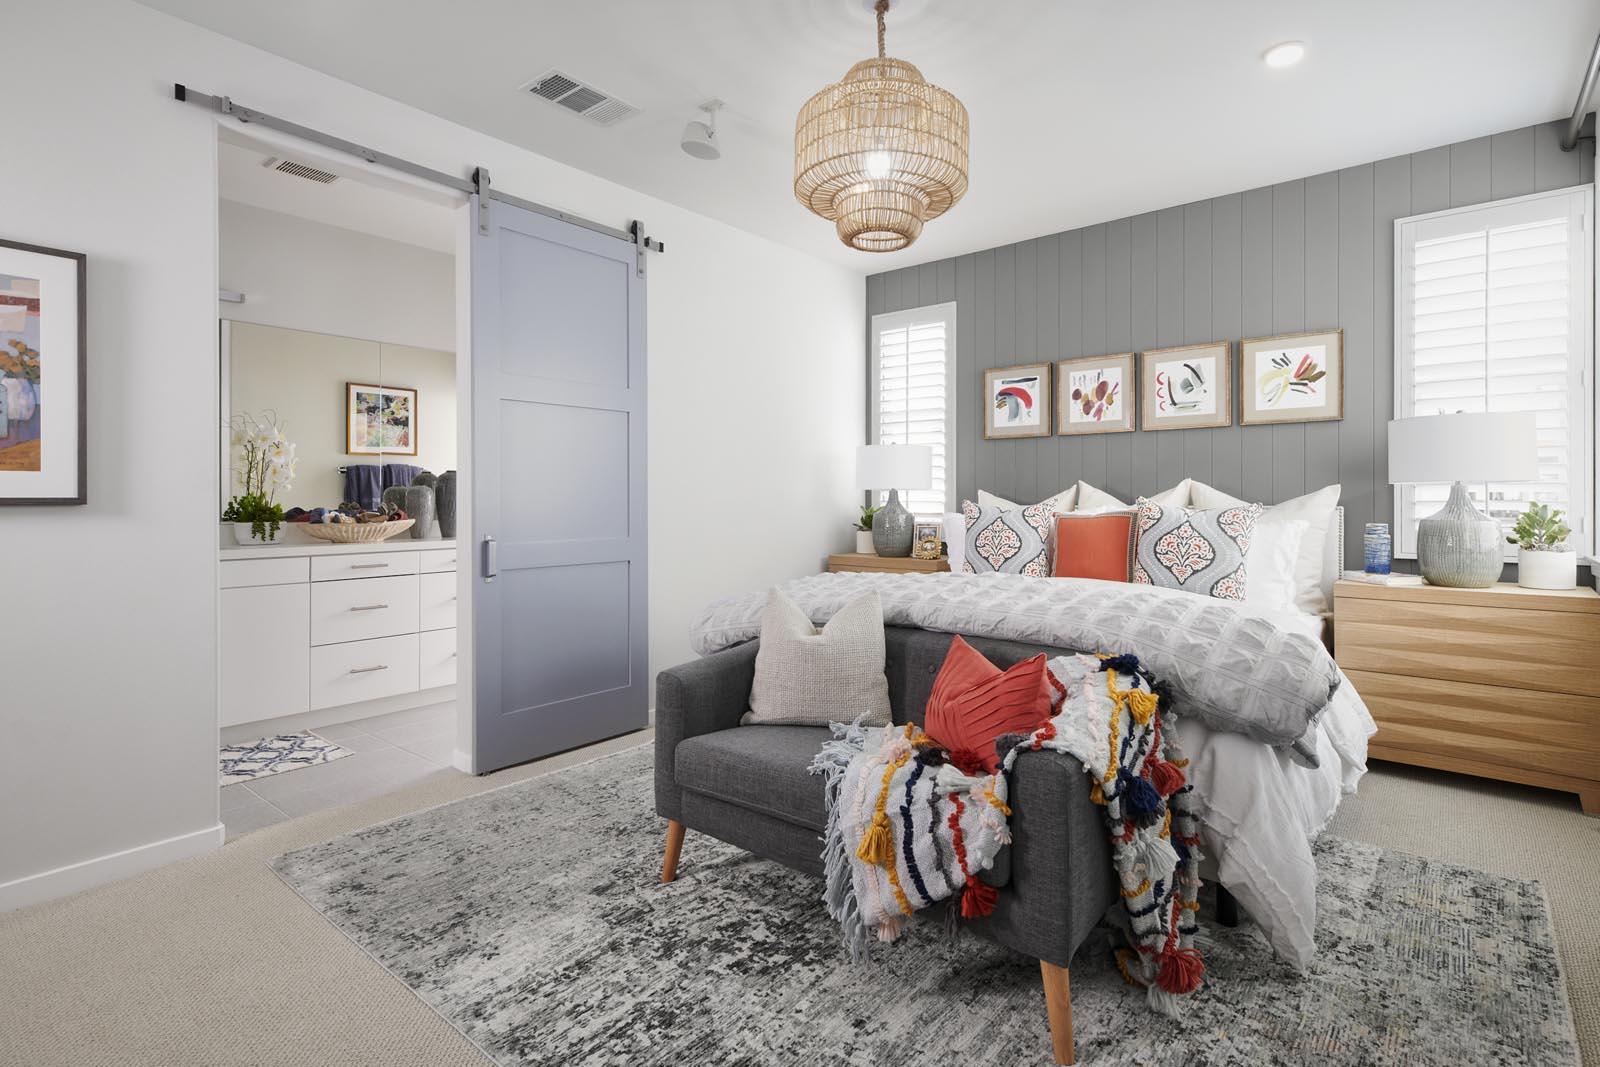 Master Bedroom   Residence 1   Enliven   New Homes in Rancho Cucamonga, CA   Van Daele Homes